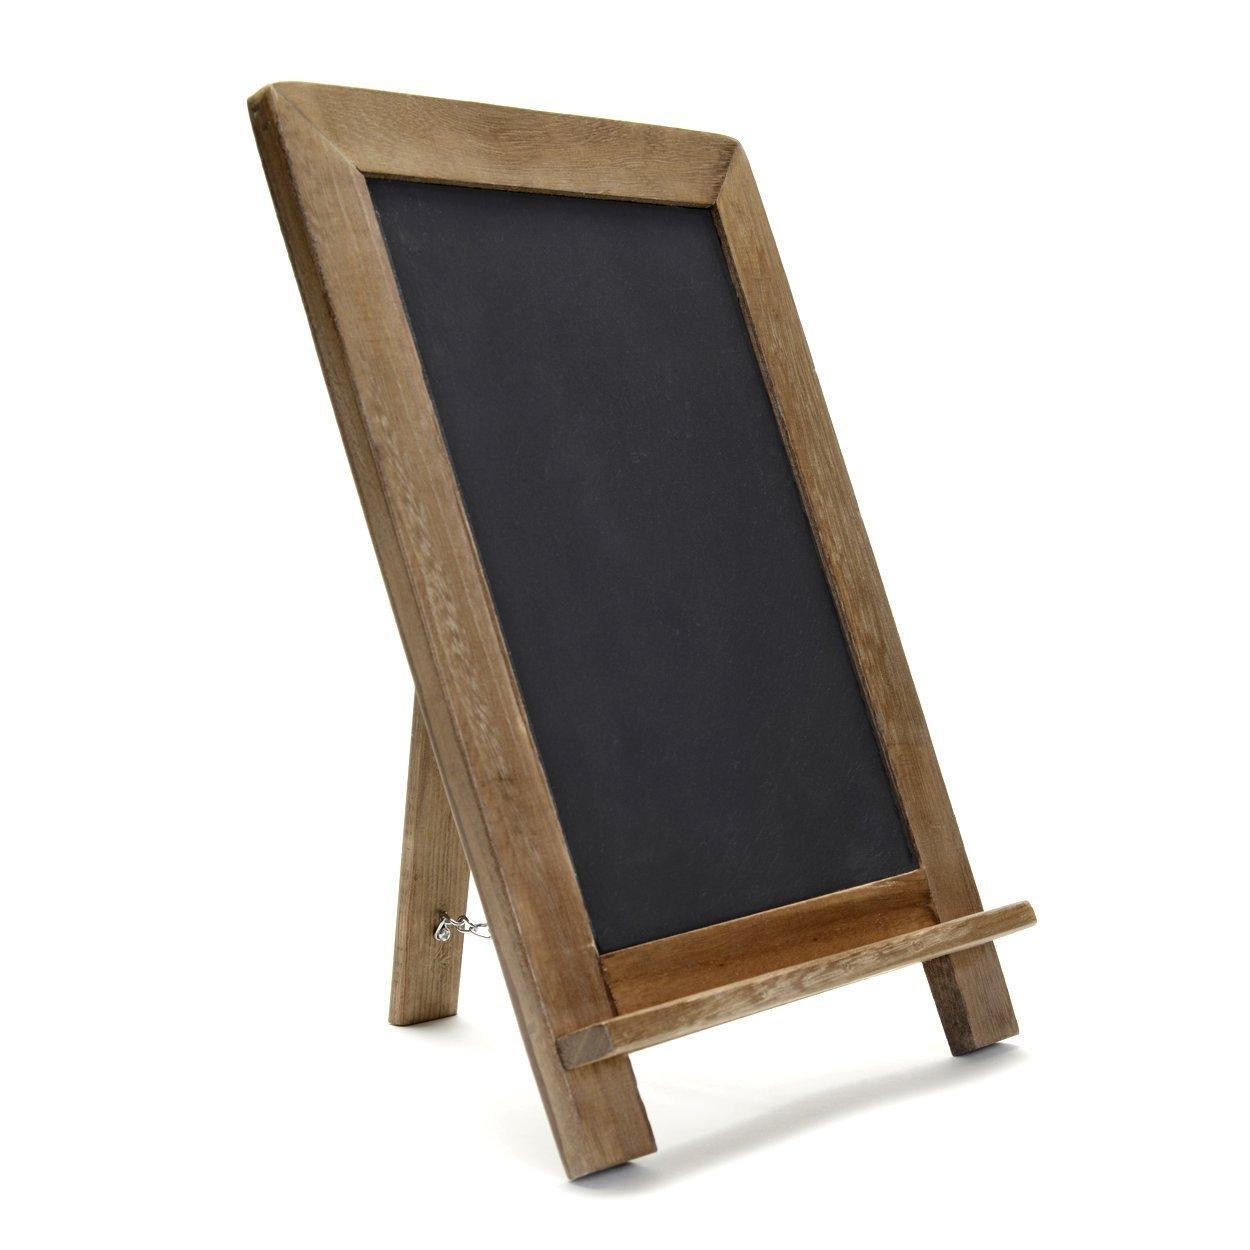 "Vintage Slate Kitchen Chalkboard (14"" x 9.5"") - Decorative Standing Chalk Board for Rustic Wedding & Kitchen Decor"